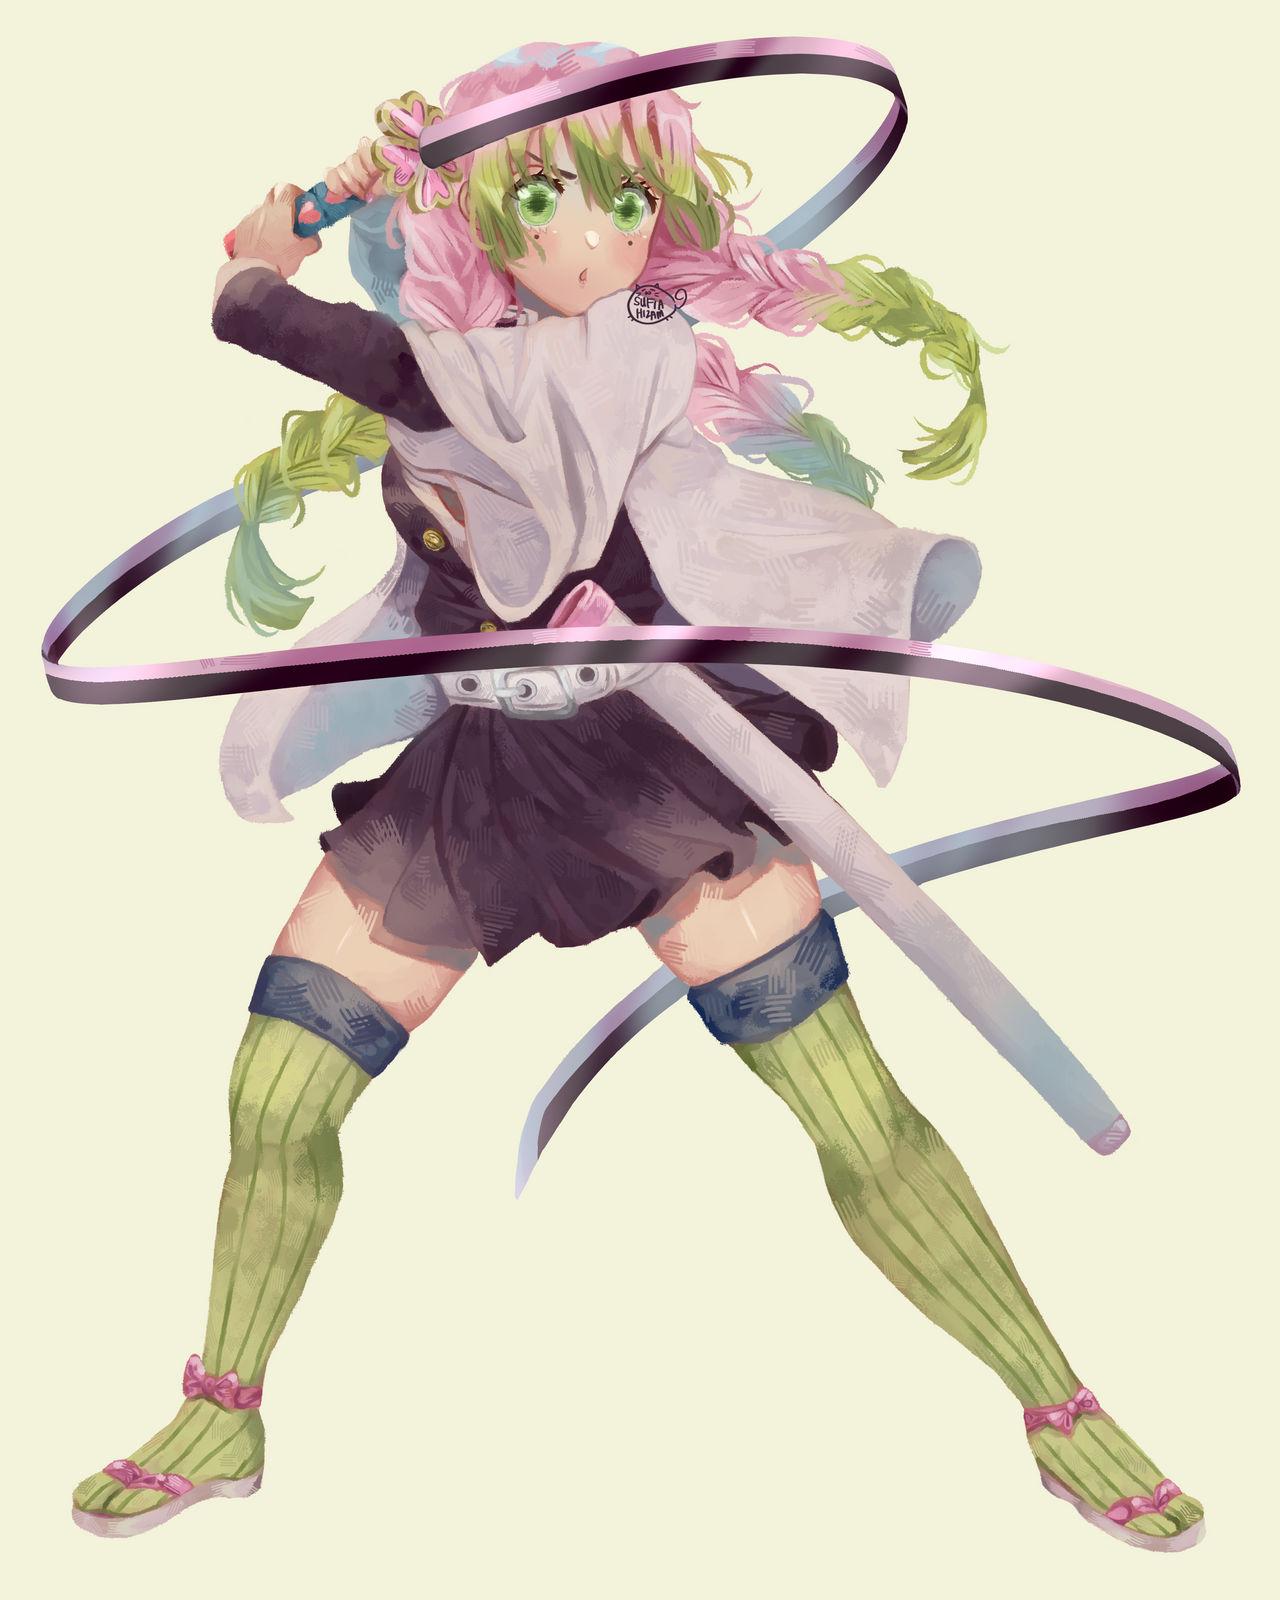 Kanroji Mitsuri Sword : I decided to make mitsuri's sword out of cardboard.